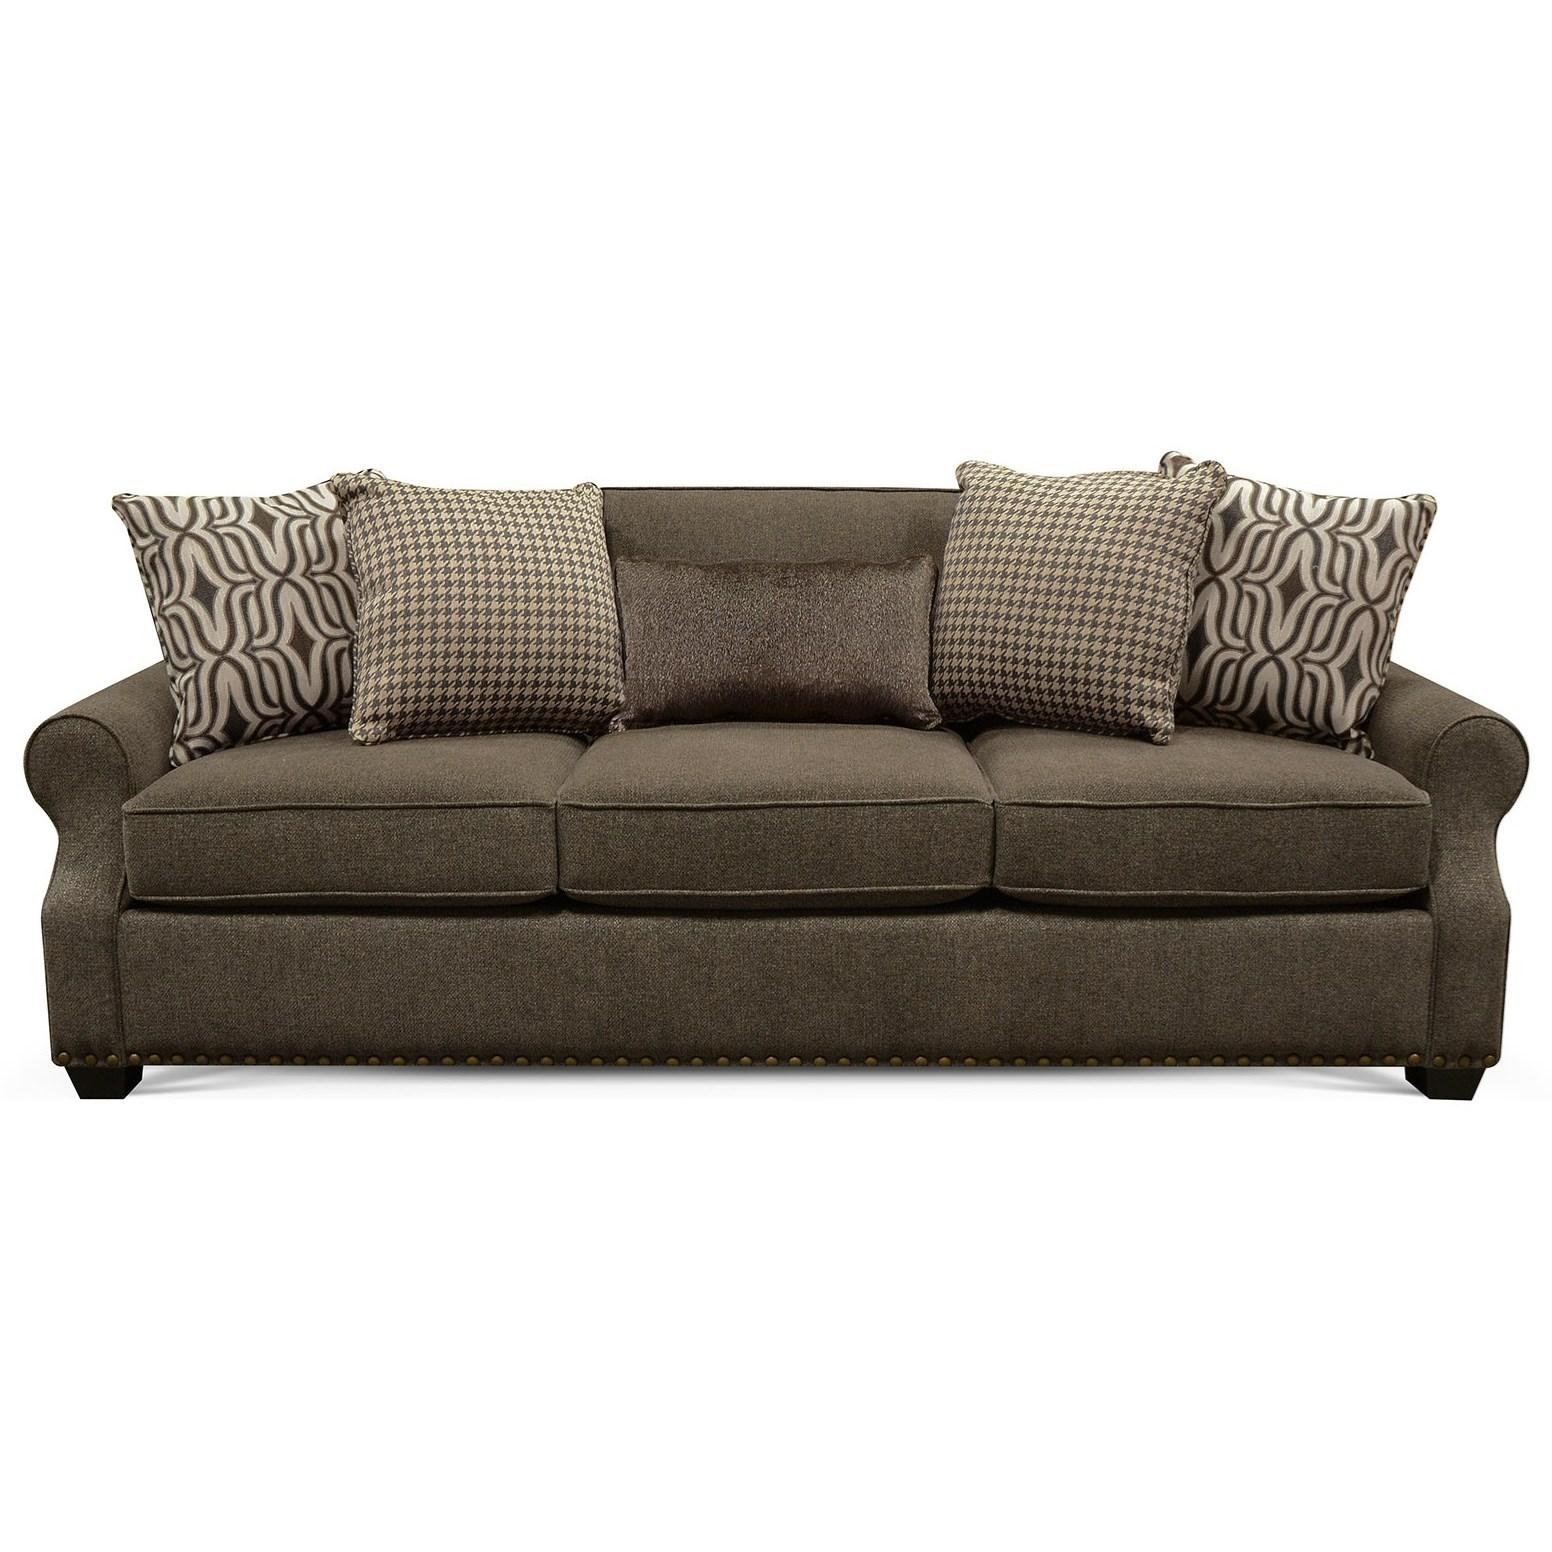 England adele sofa with nailheads van hill furniture sofas for Sofa 400 euro